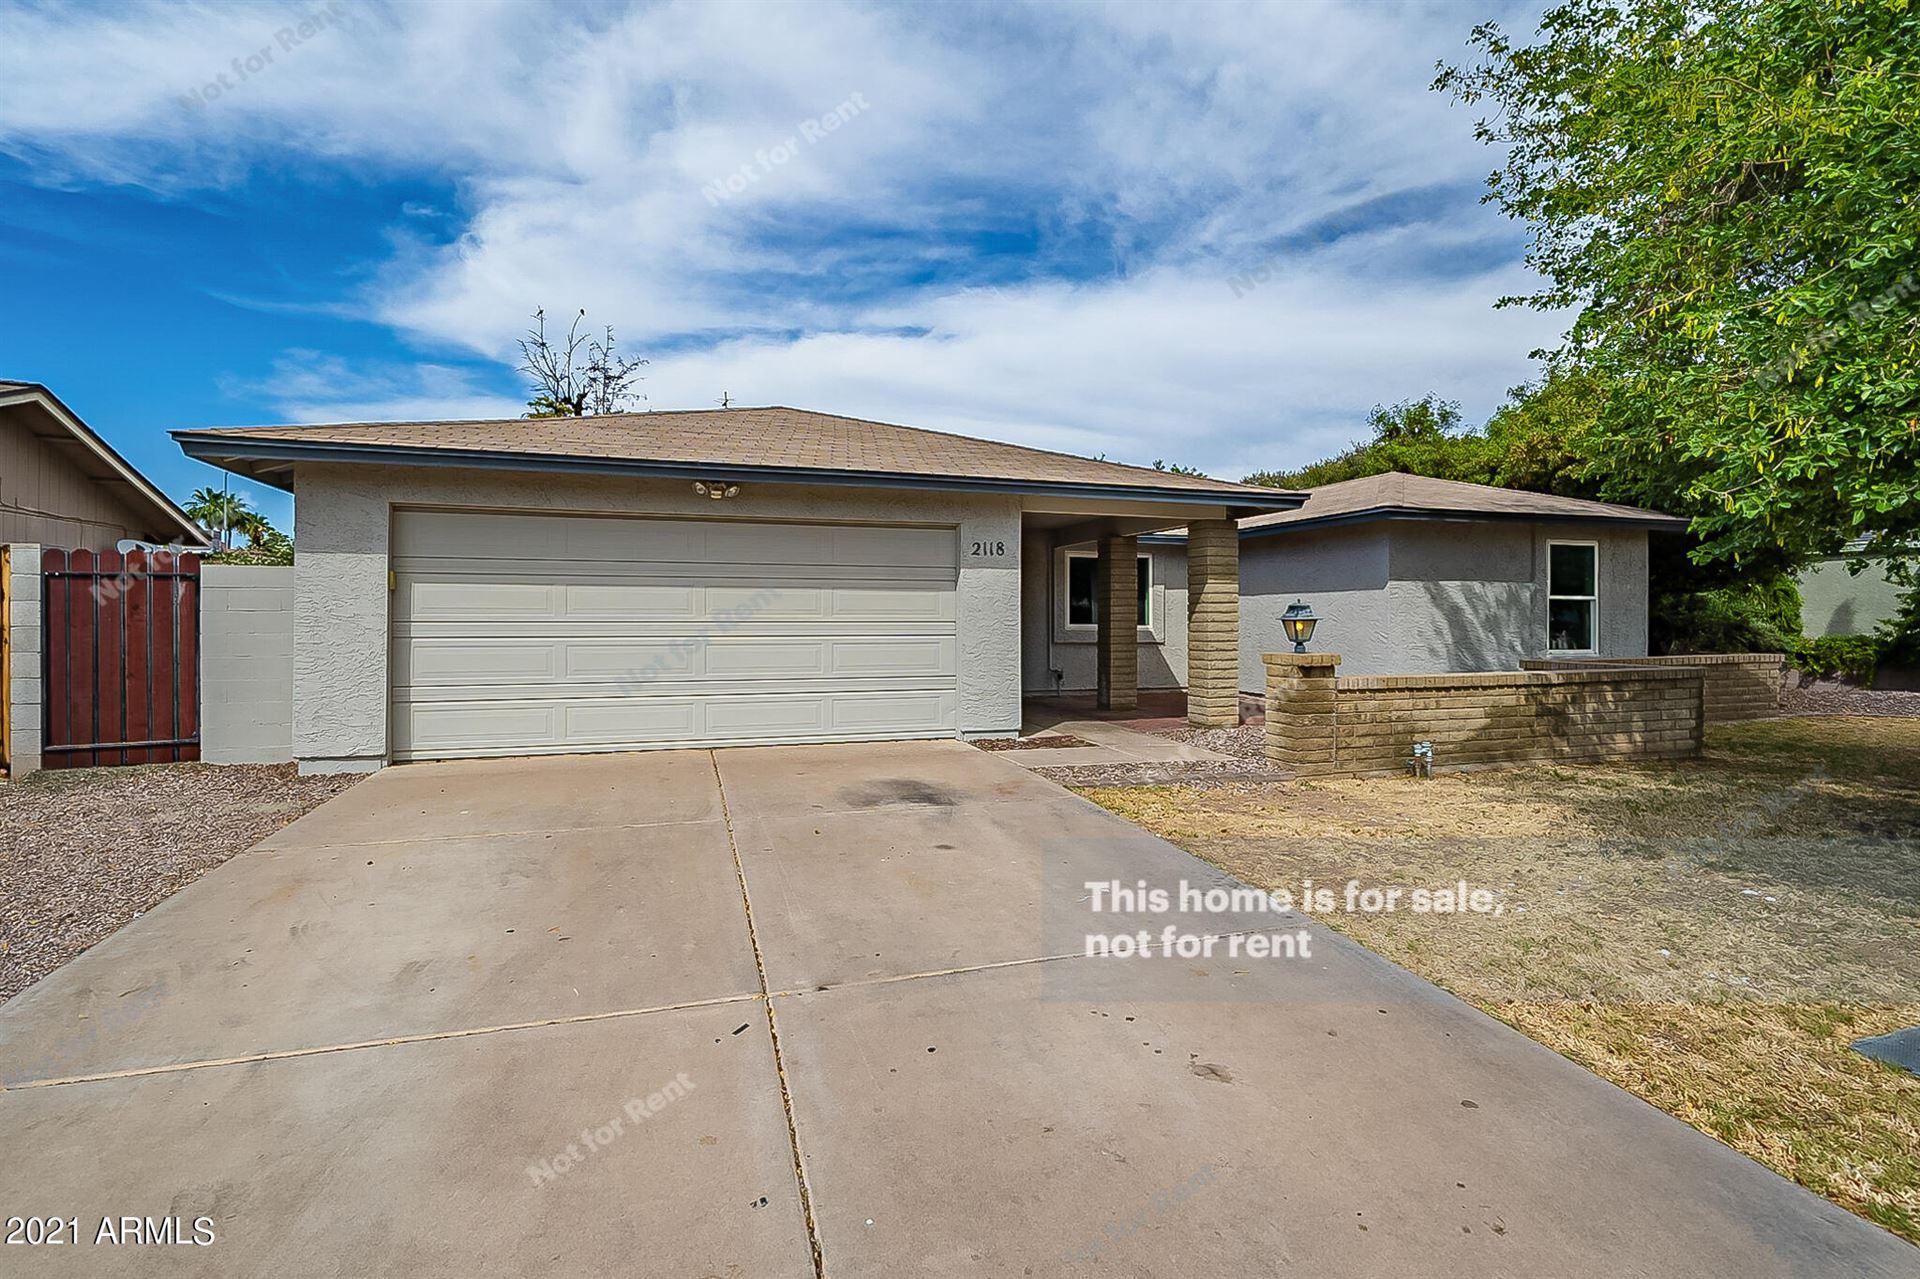 Photo of 2118 E CATALINA Avenue, Mesa, AZ 85204 (MLS # 6249645)